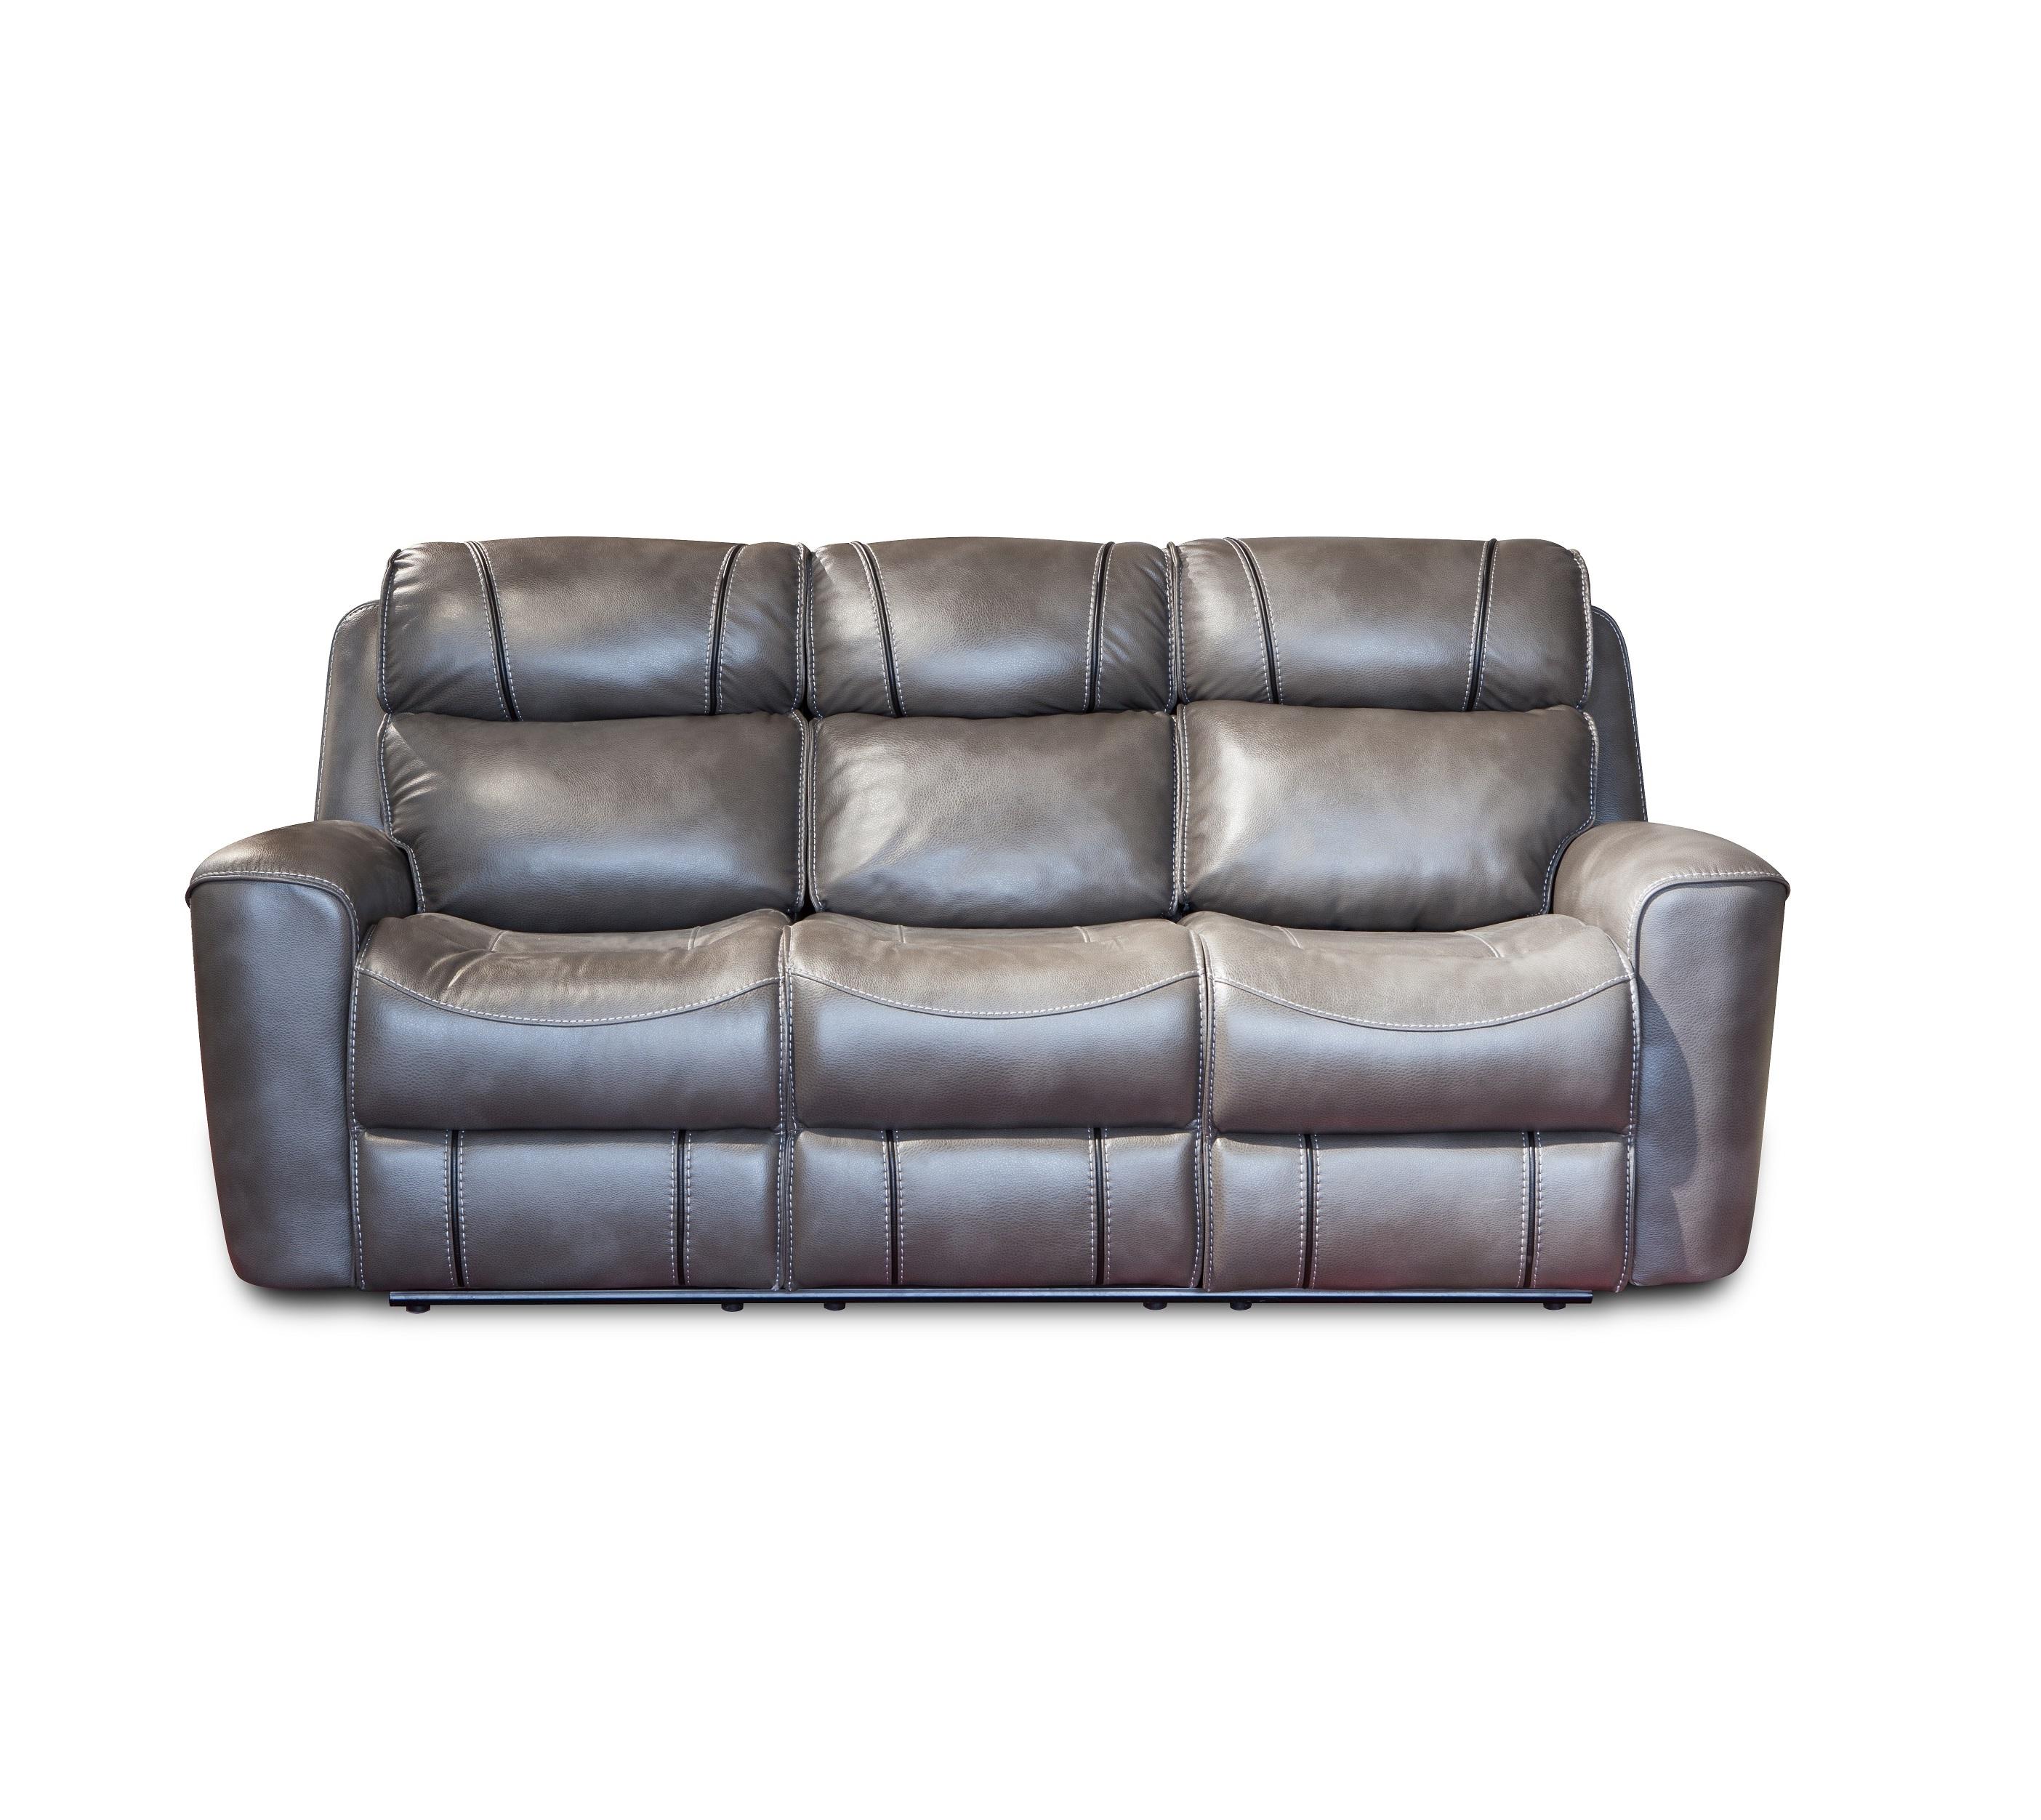 Fancy Living Room Furniture Swivel Rocker Recliner Sofa Product On Alibaba